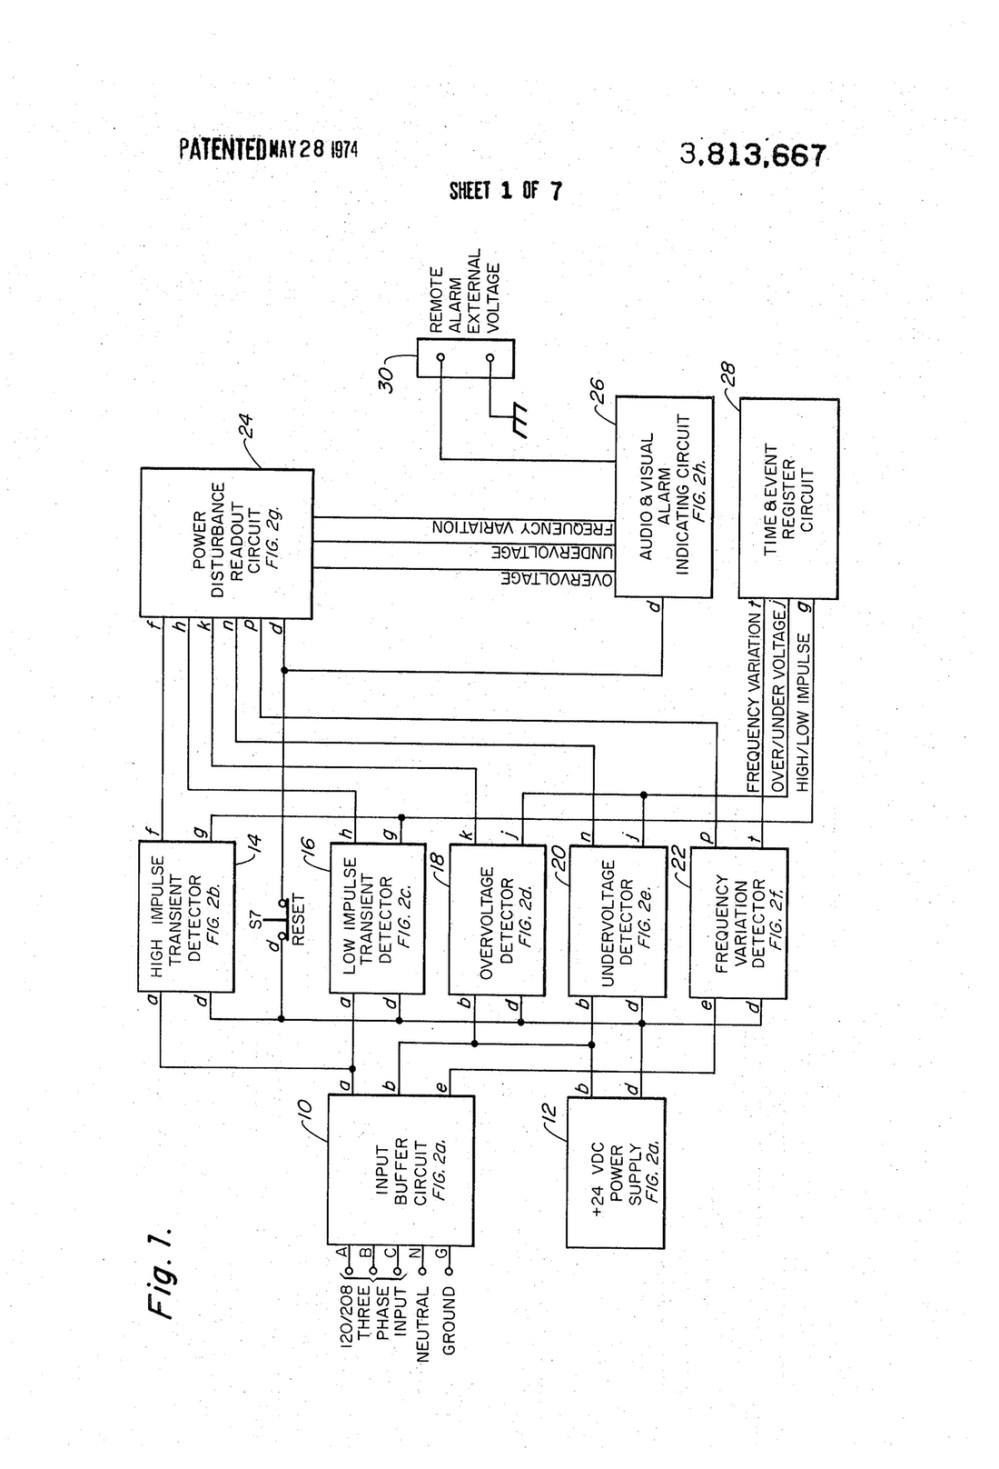 medium resolution of residential wiring diagram software electrical wiring diagram software wire diagram electrical floor plan 2004